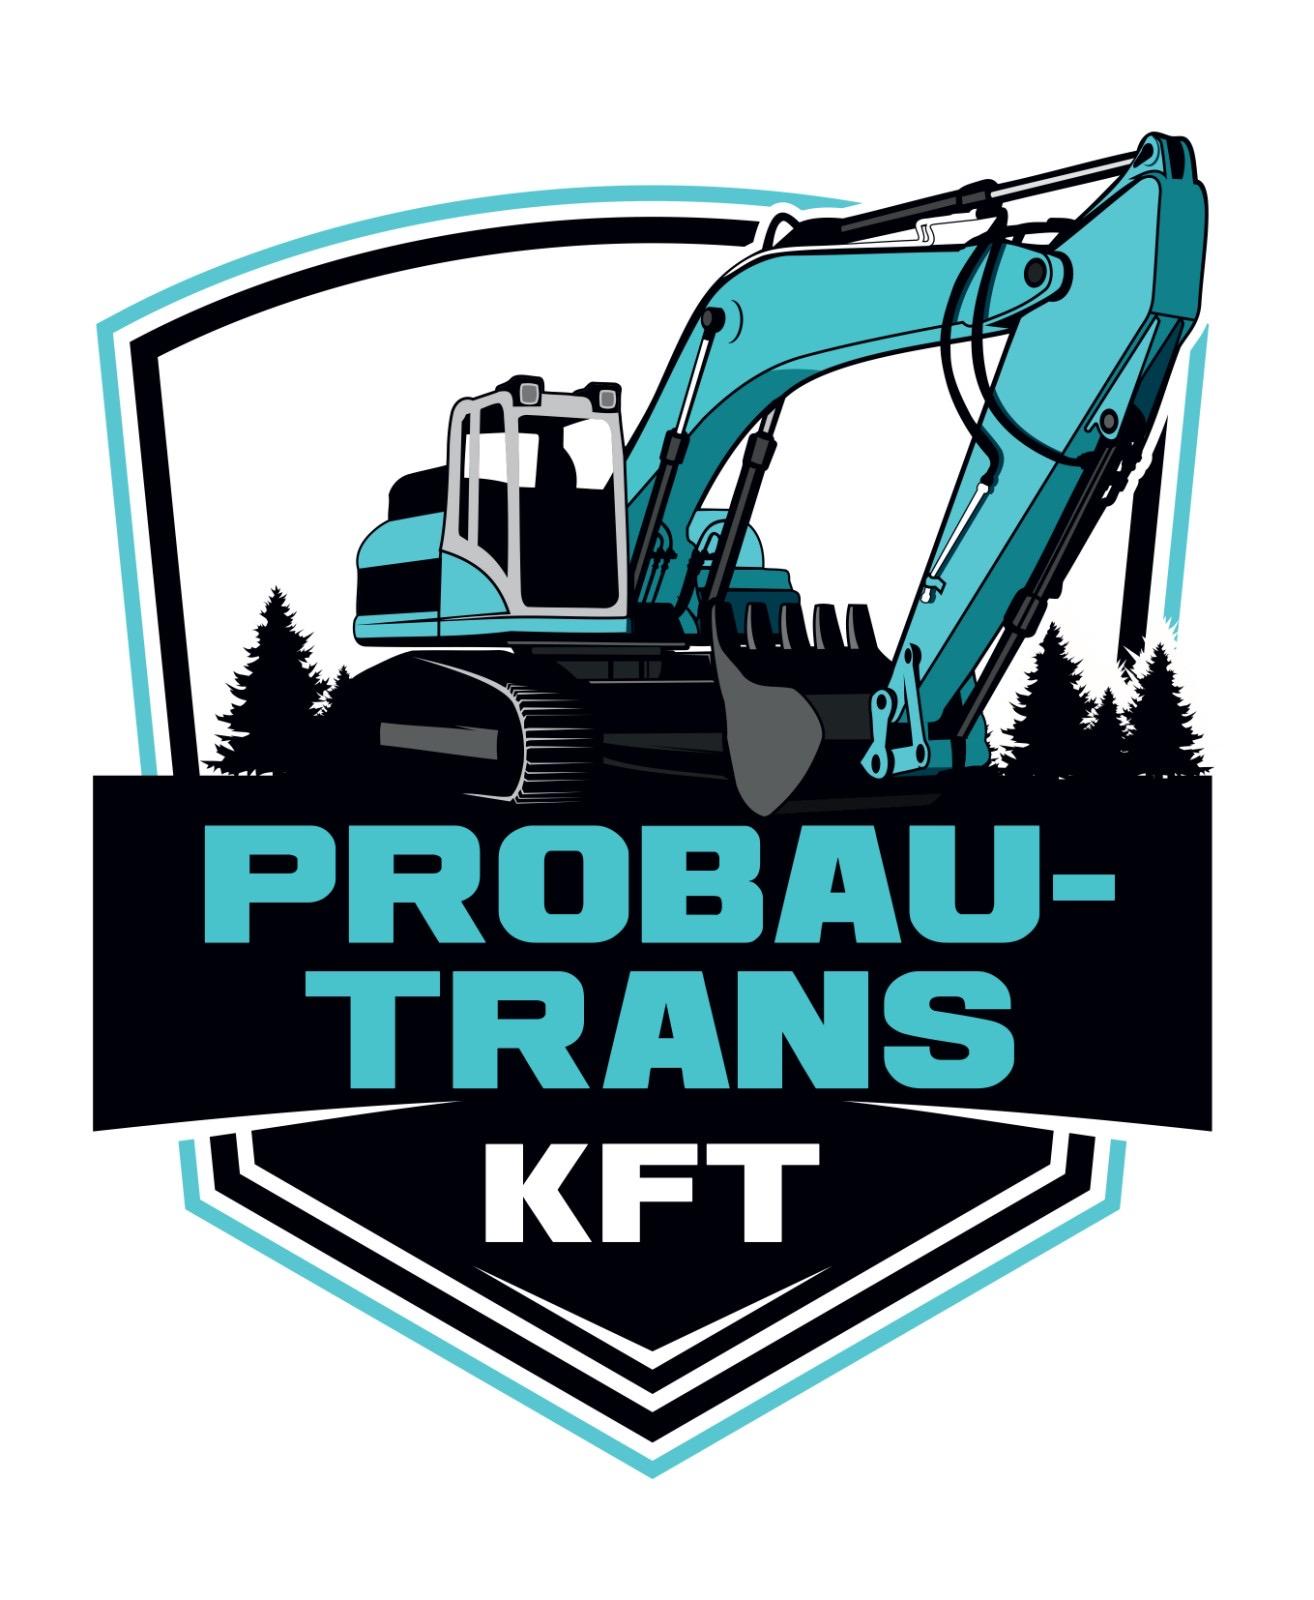 Probau-Trans Kft.